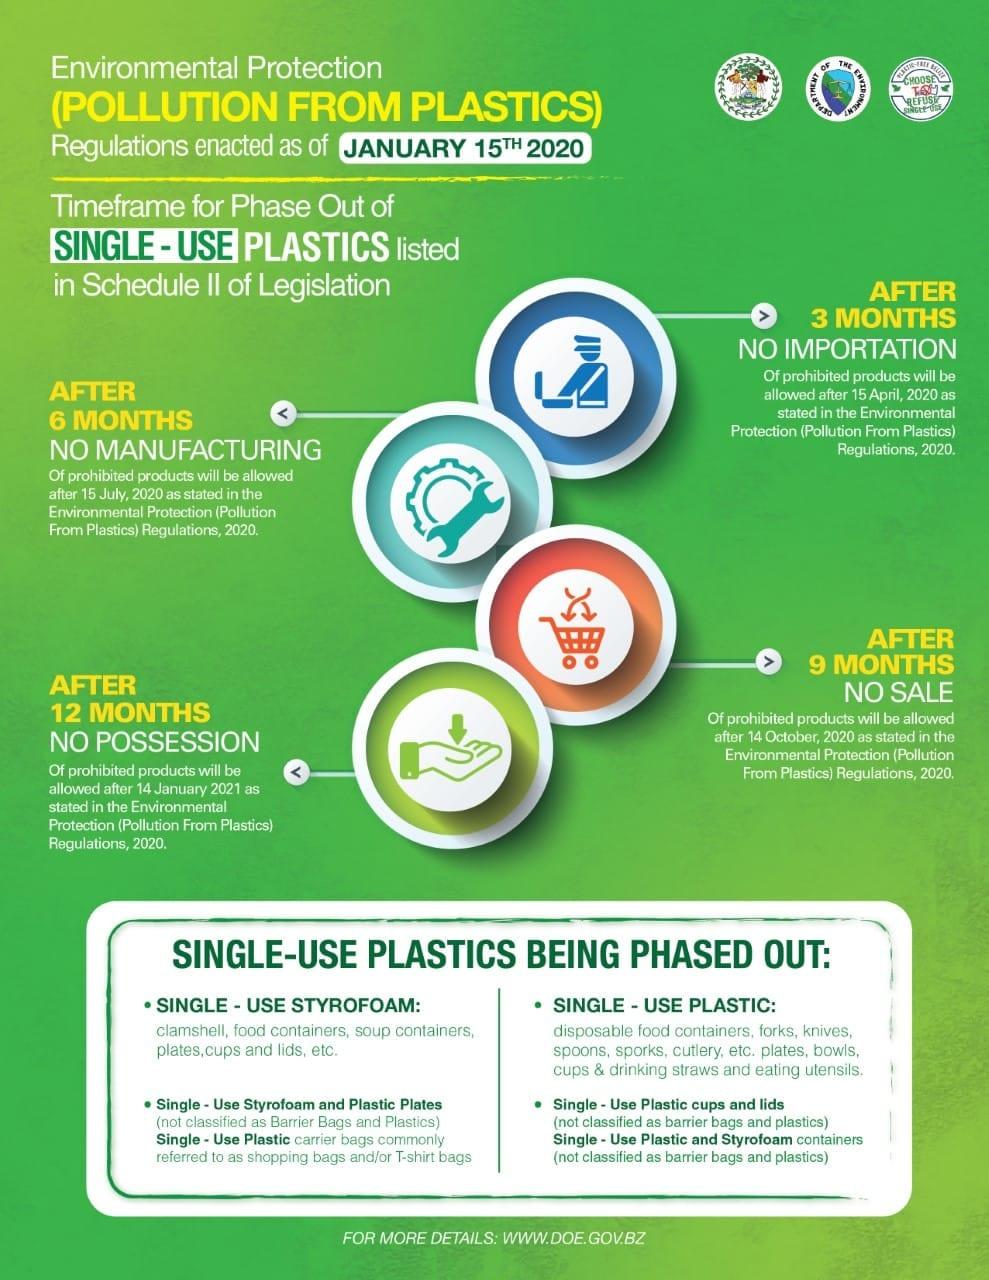 single use plastic phase out timeline DOE